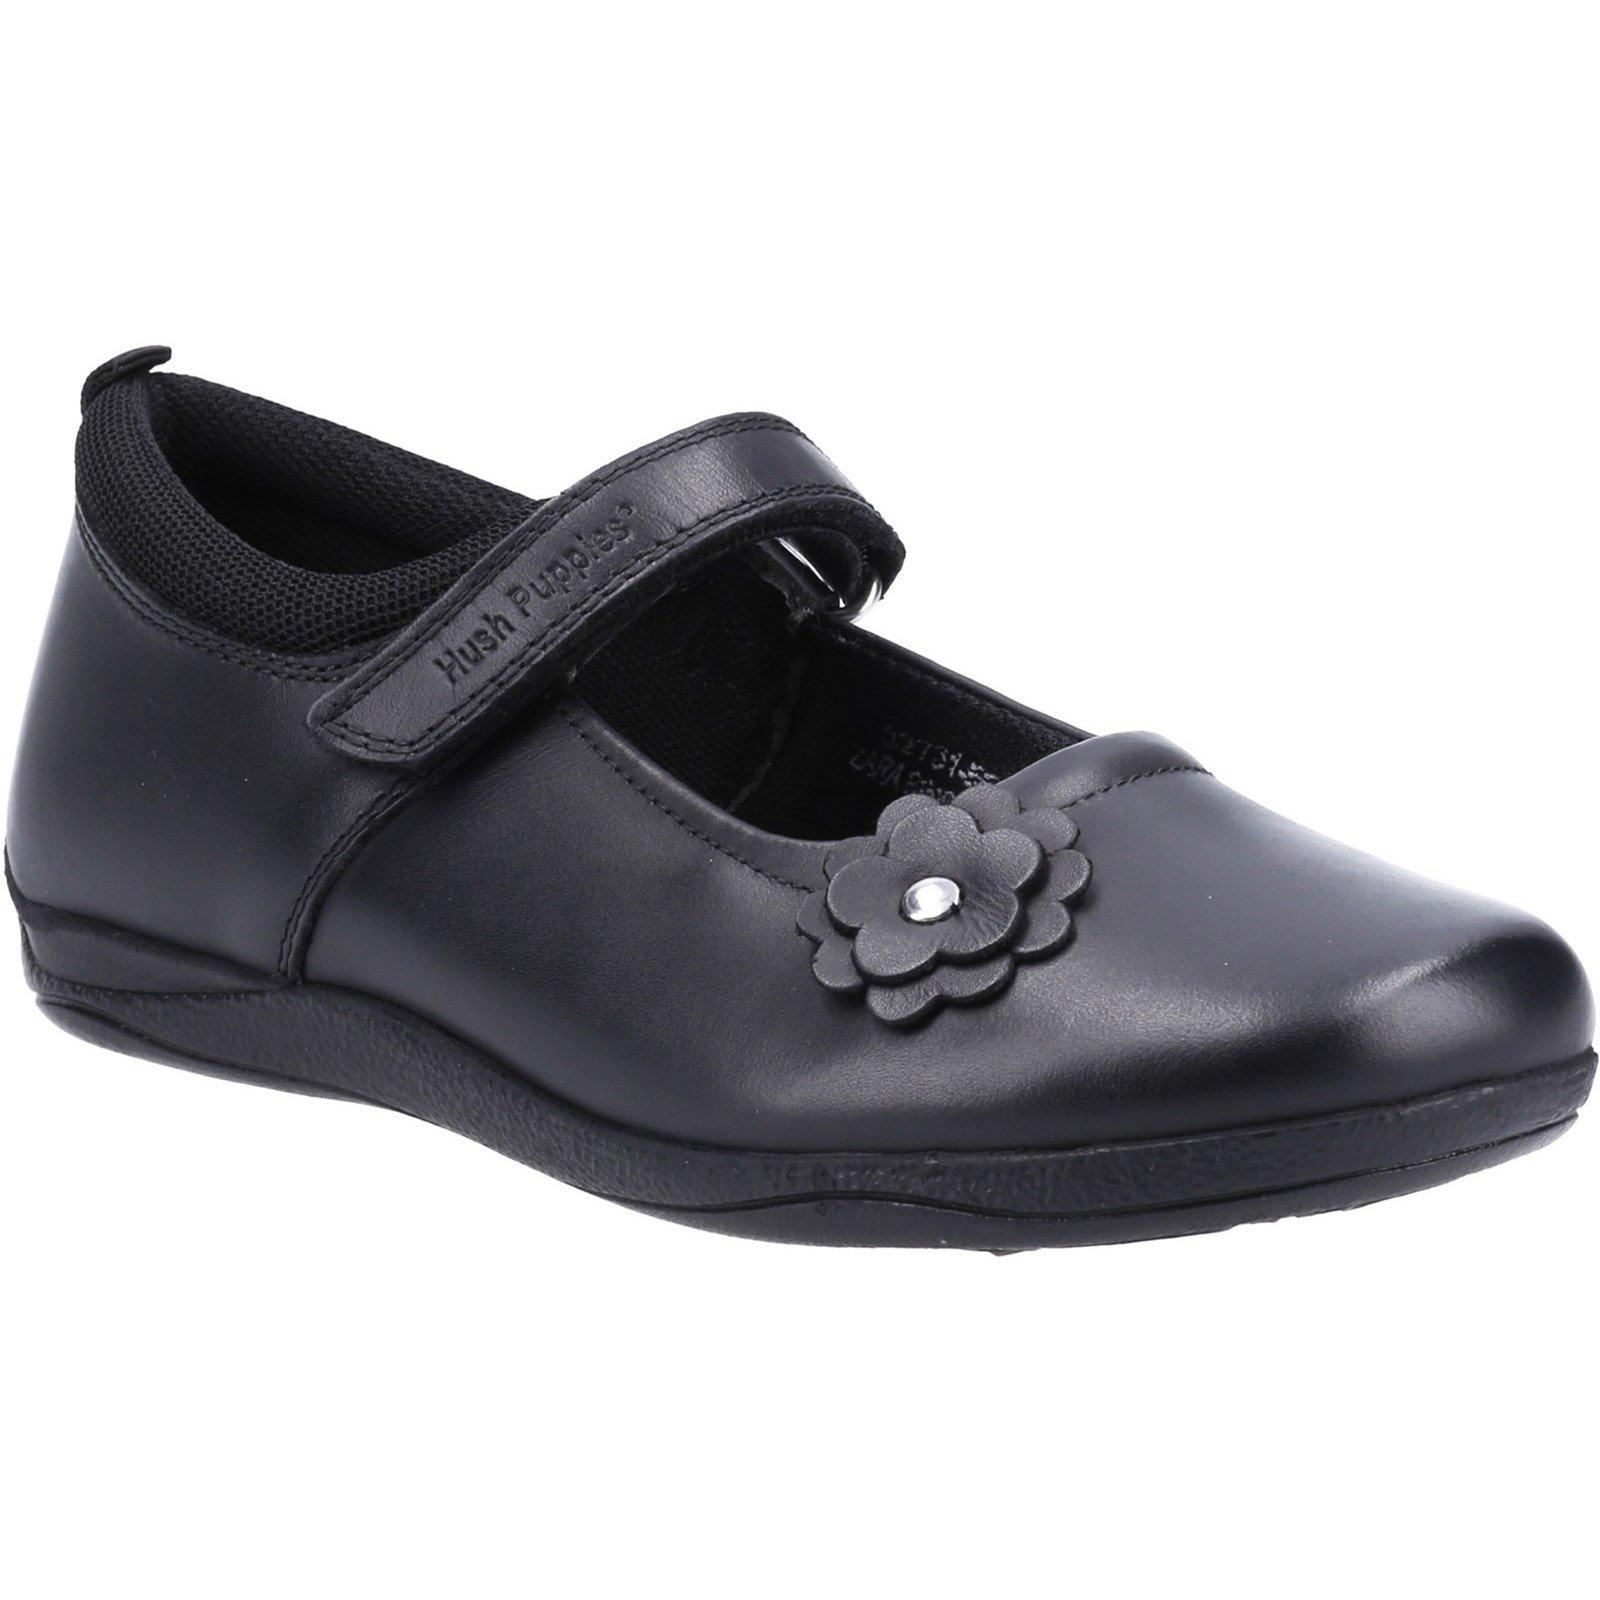 Hush Puppies Kid's Zara Senior School Flat Shoe Black 32732 - Black 4